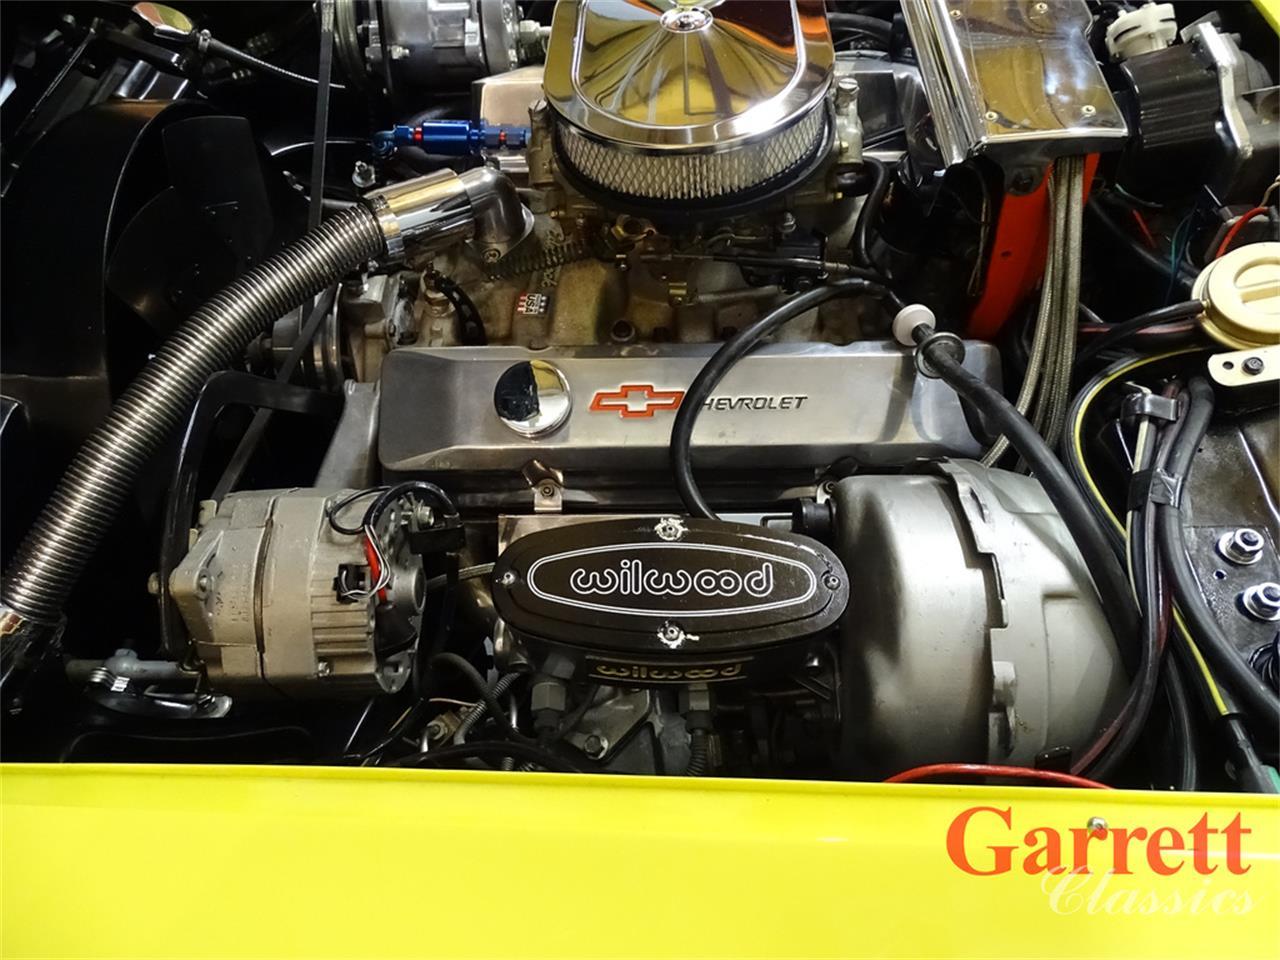 Large Picture of 1970 Corvette - $58,000.00 Offered by Garrett Classics - PJTL